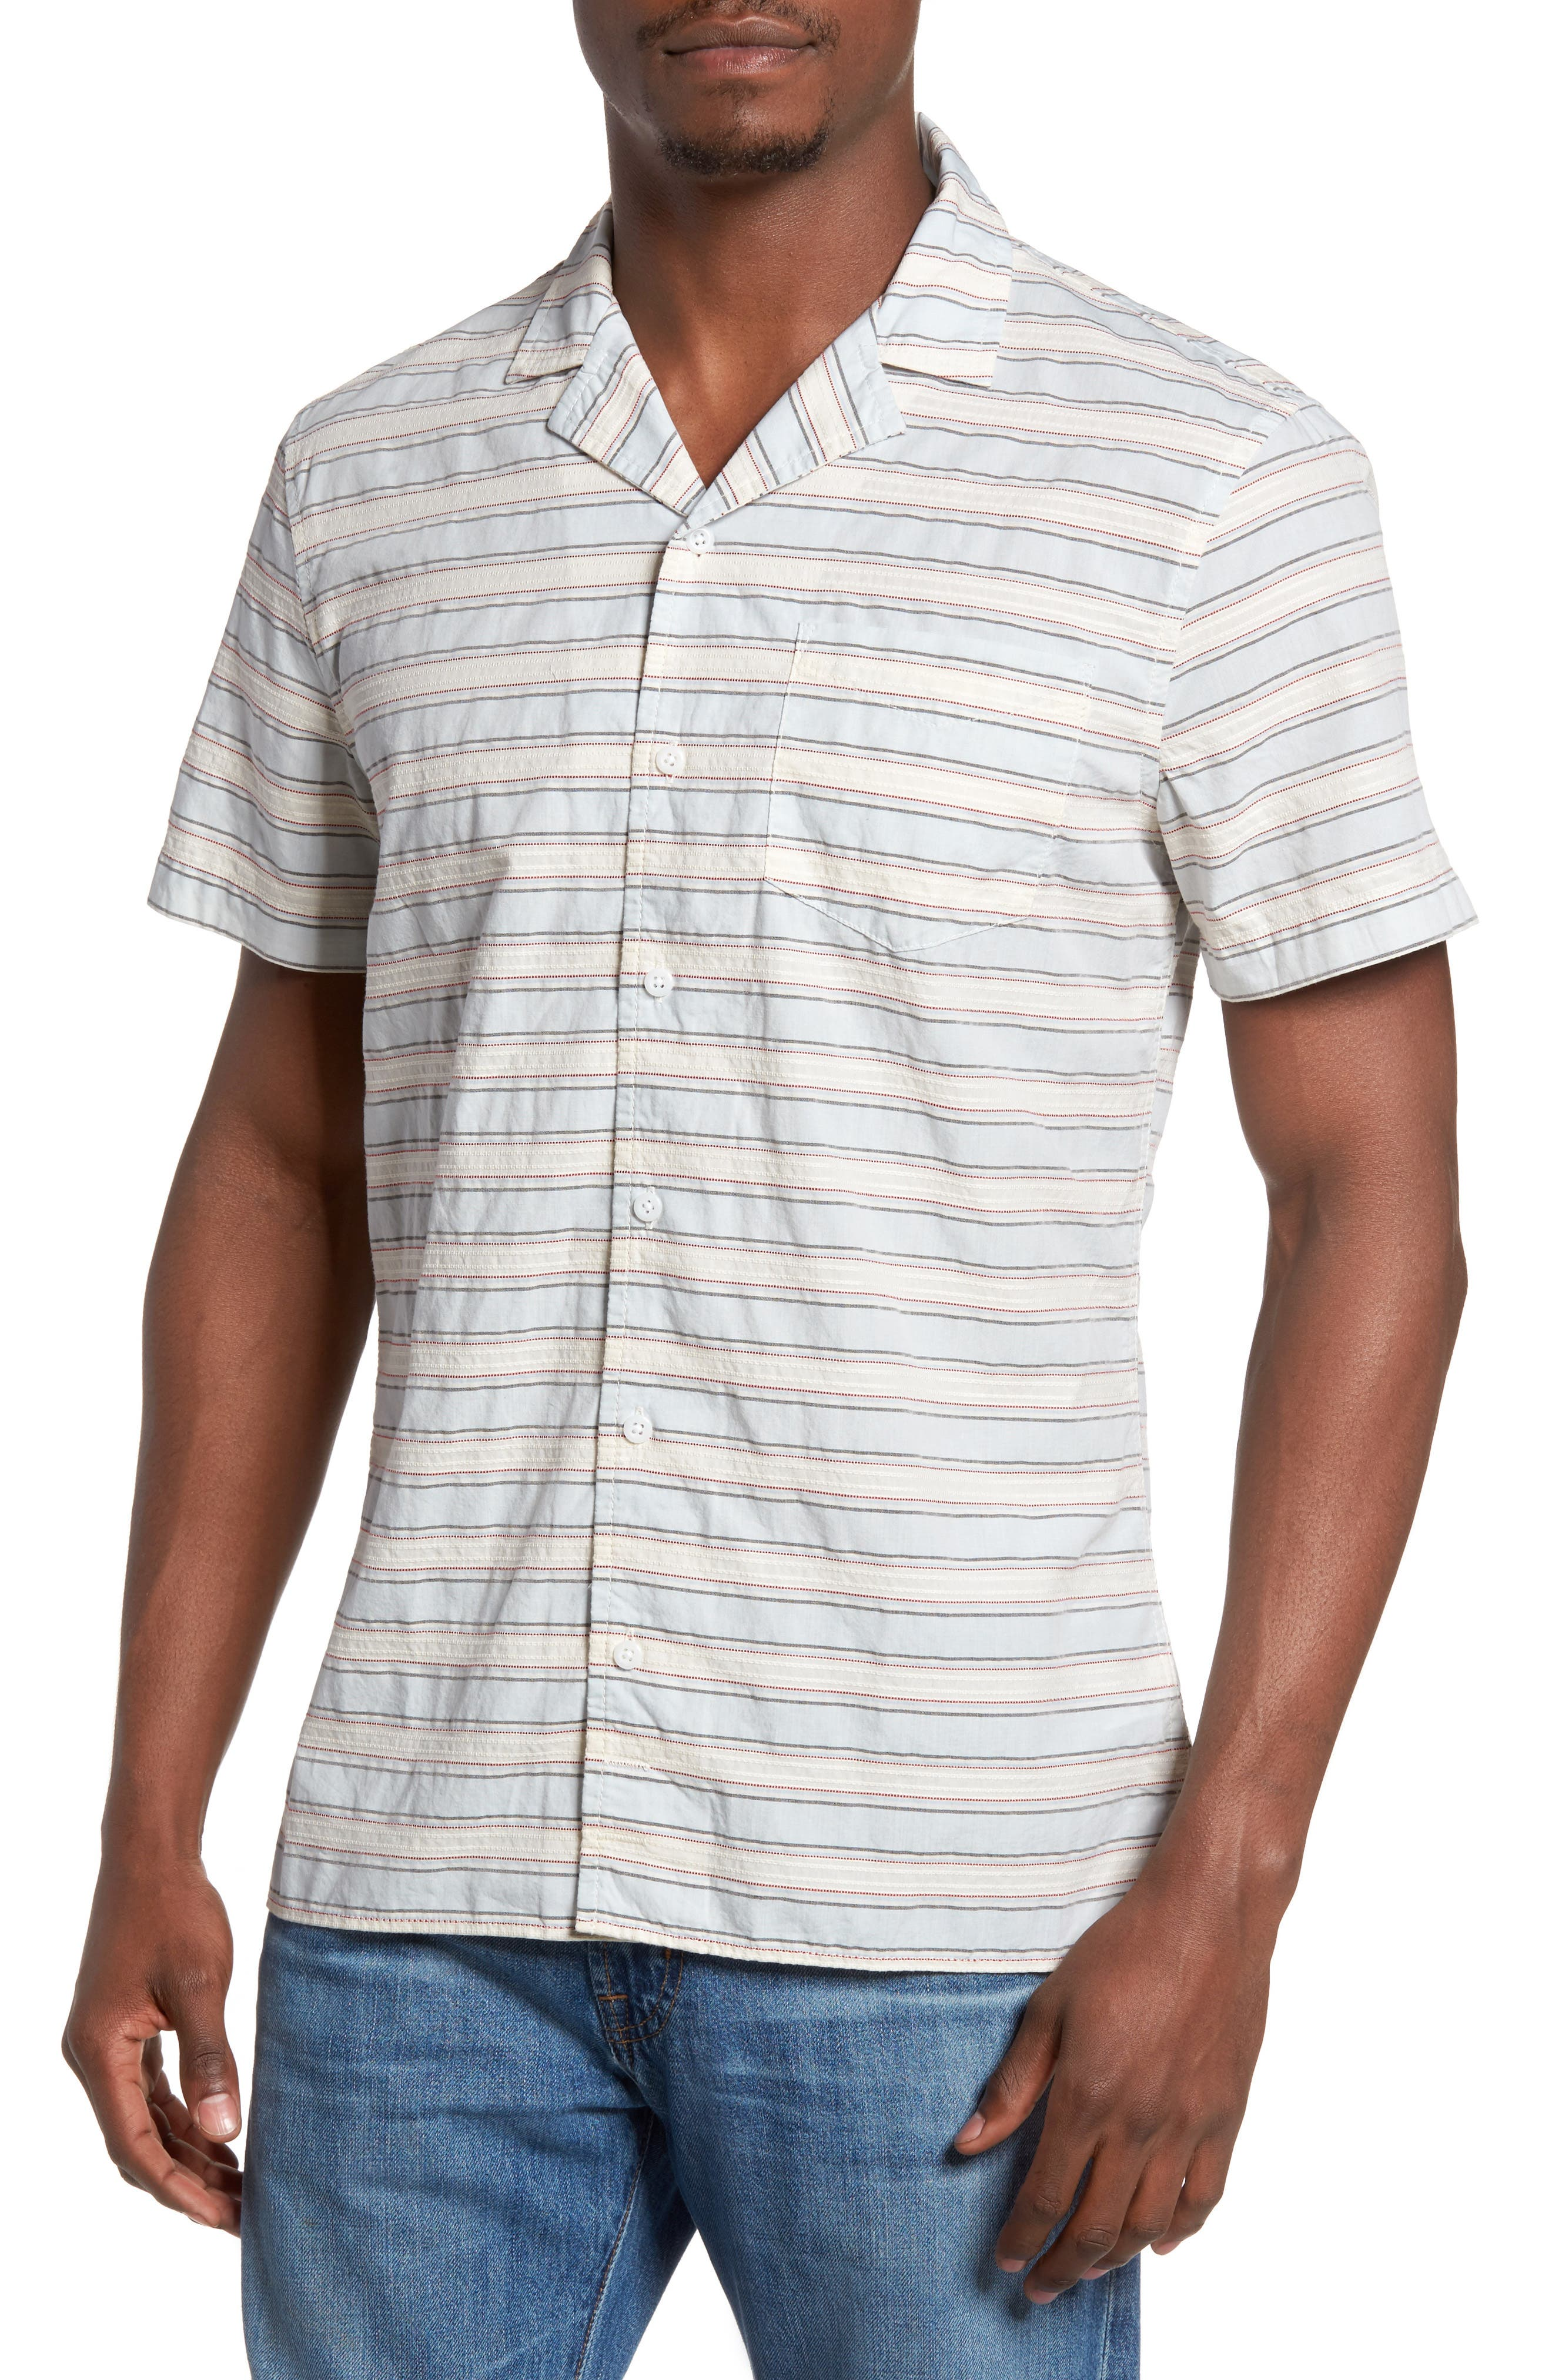 1901 Jacquard Stripe Camp Shirt